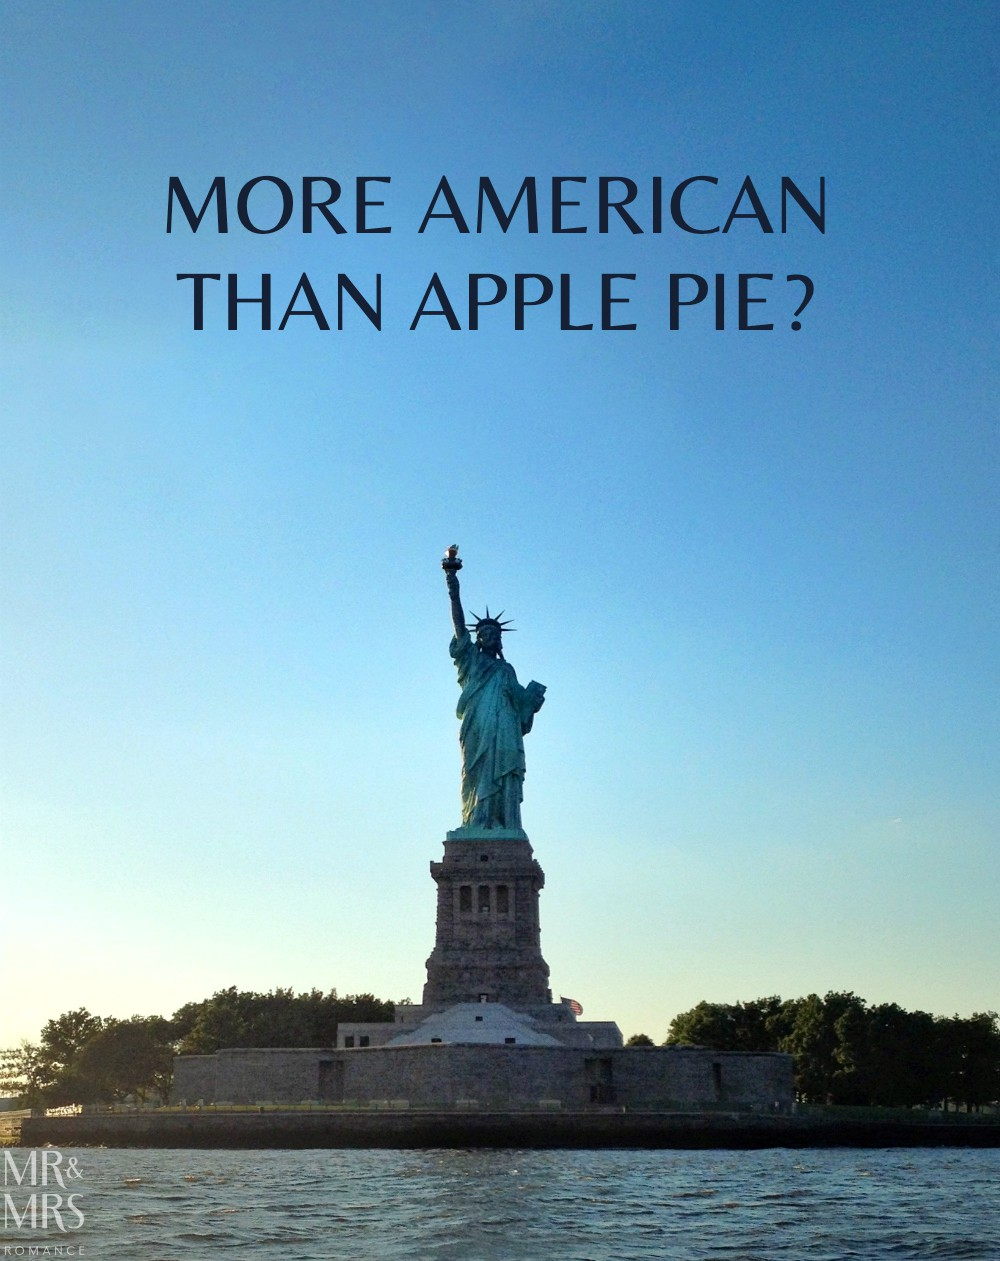 American hotdogs - Statue of Liberty